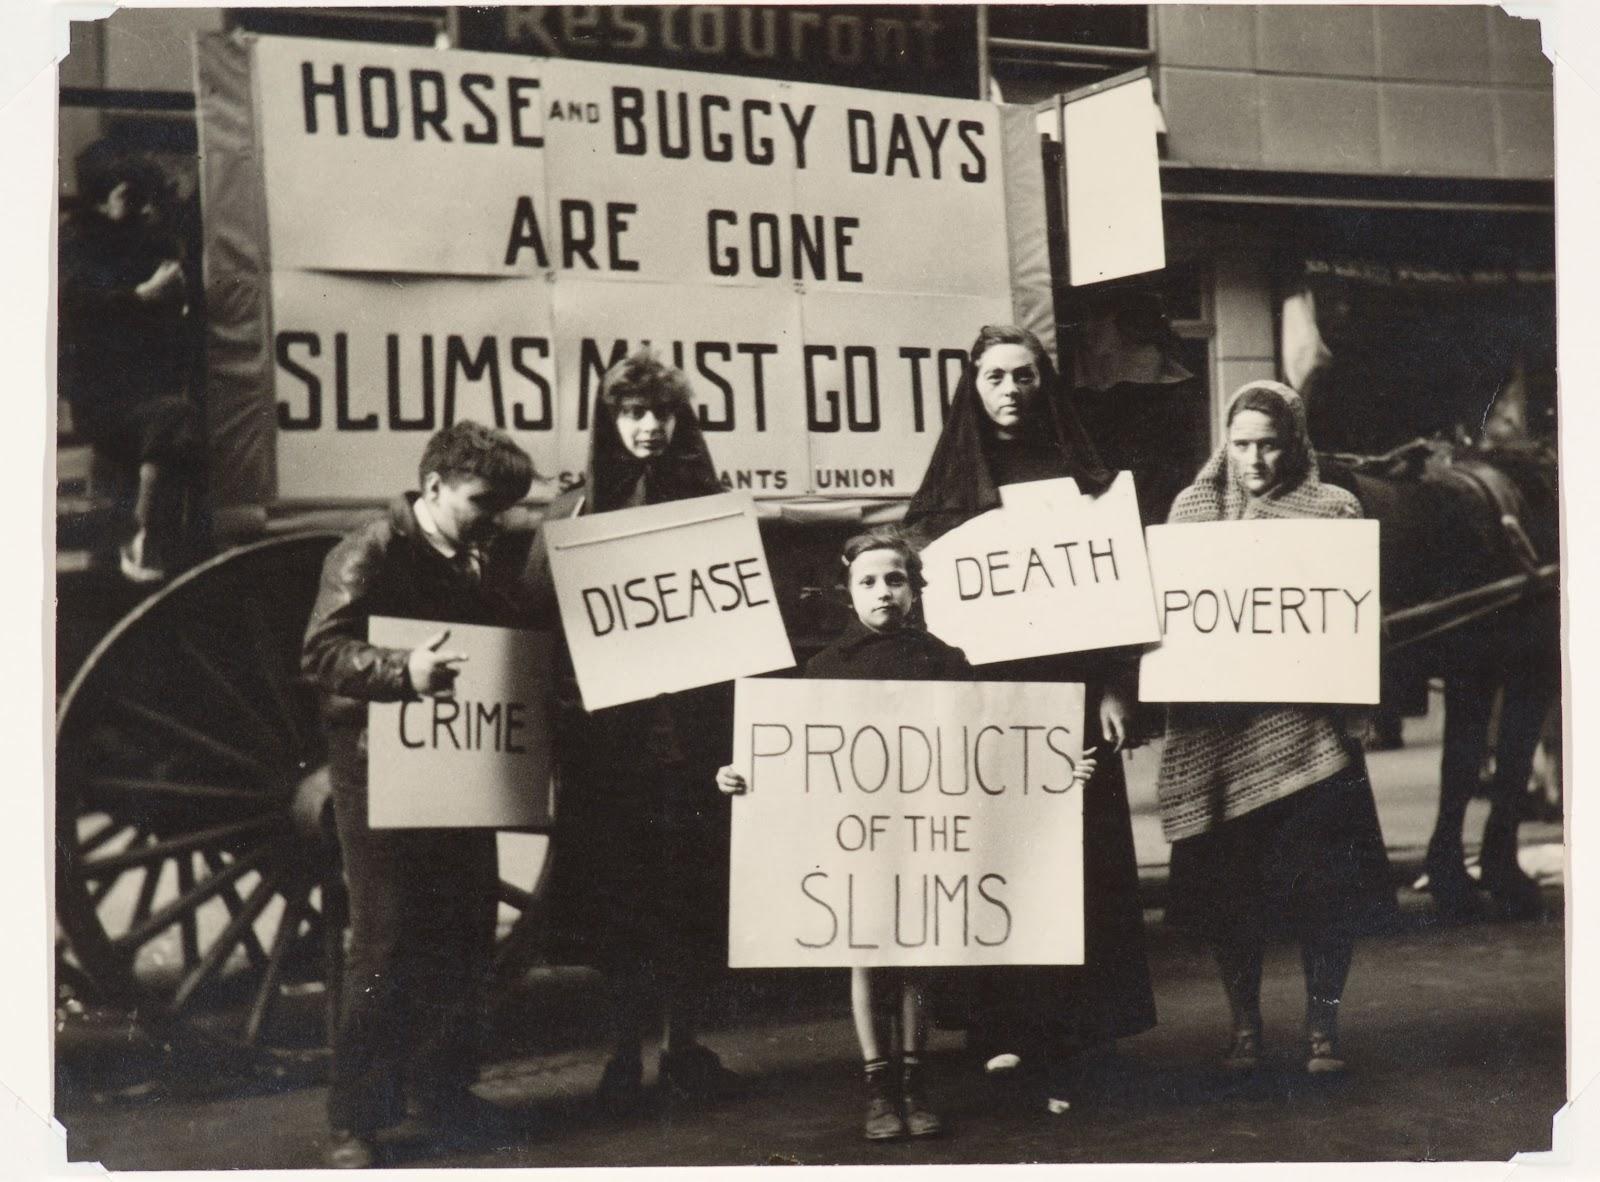 Slums Must Go! May Day Parade, New York, c. 1936 ©Joe Schwartz